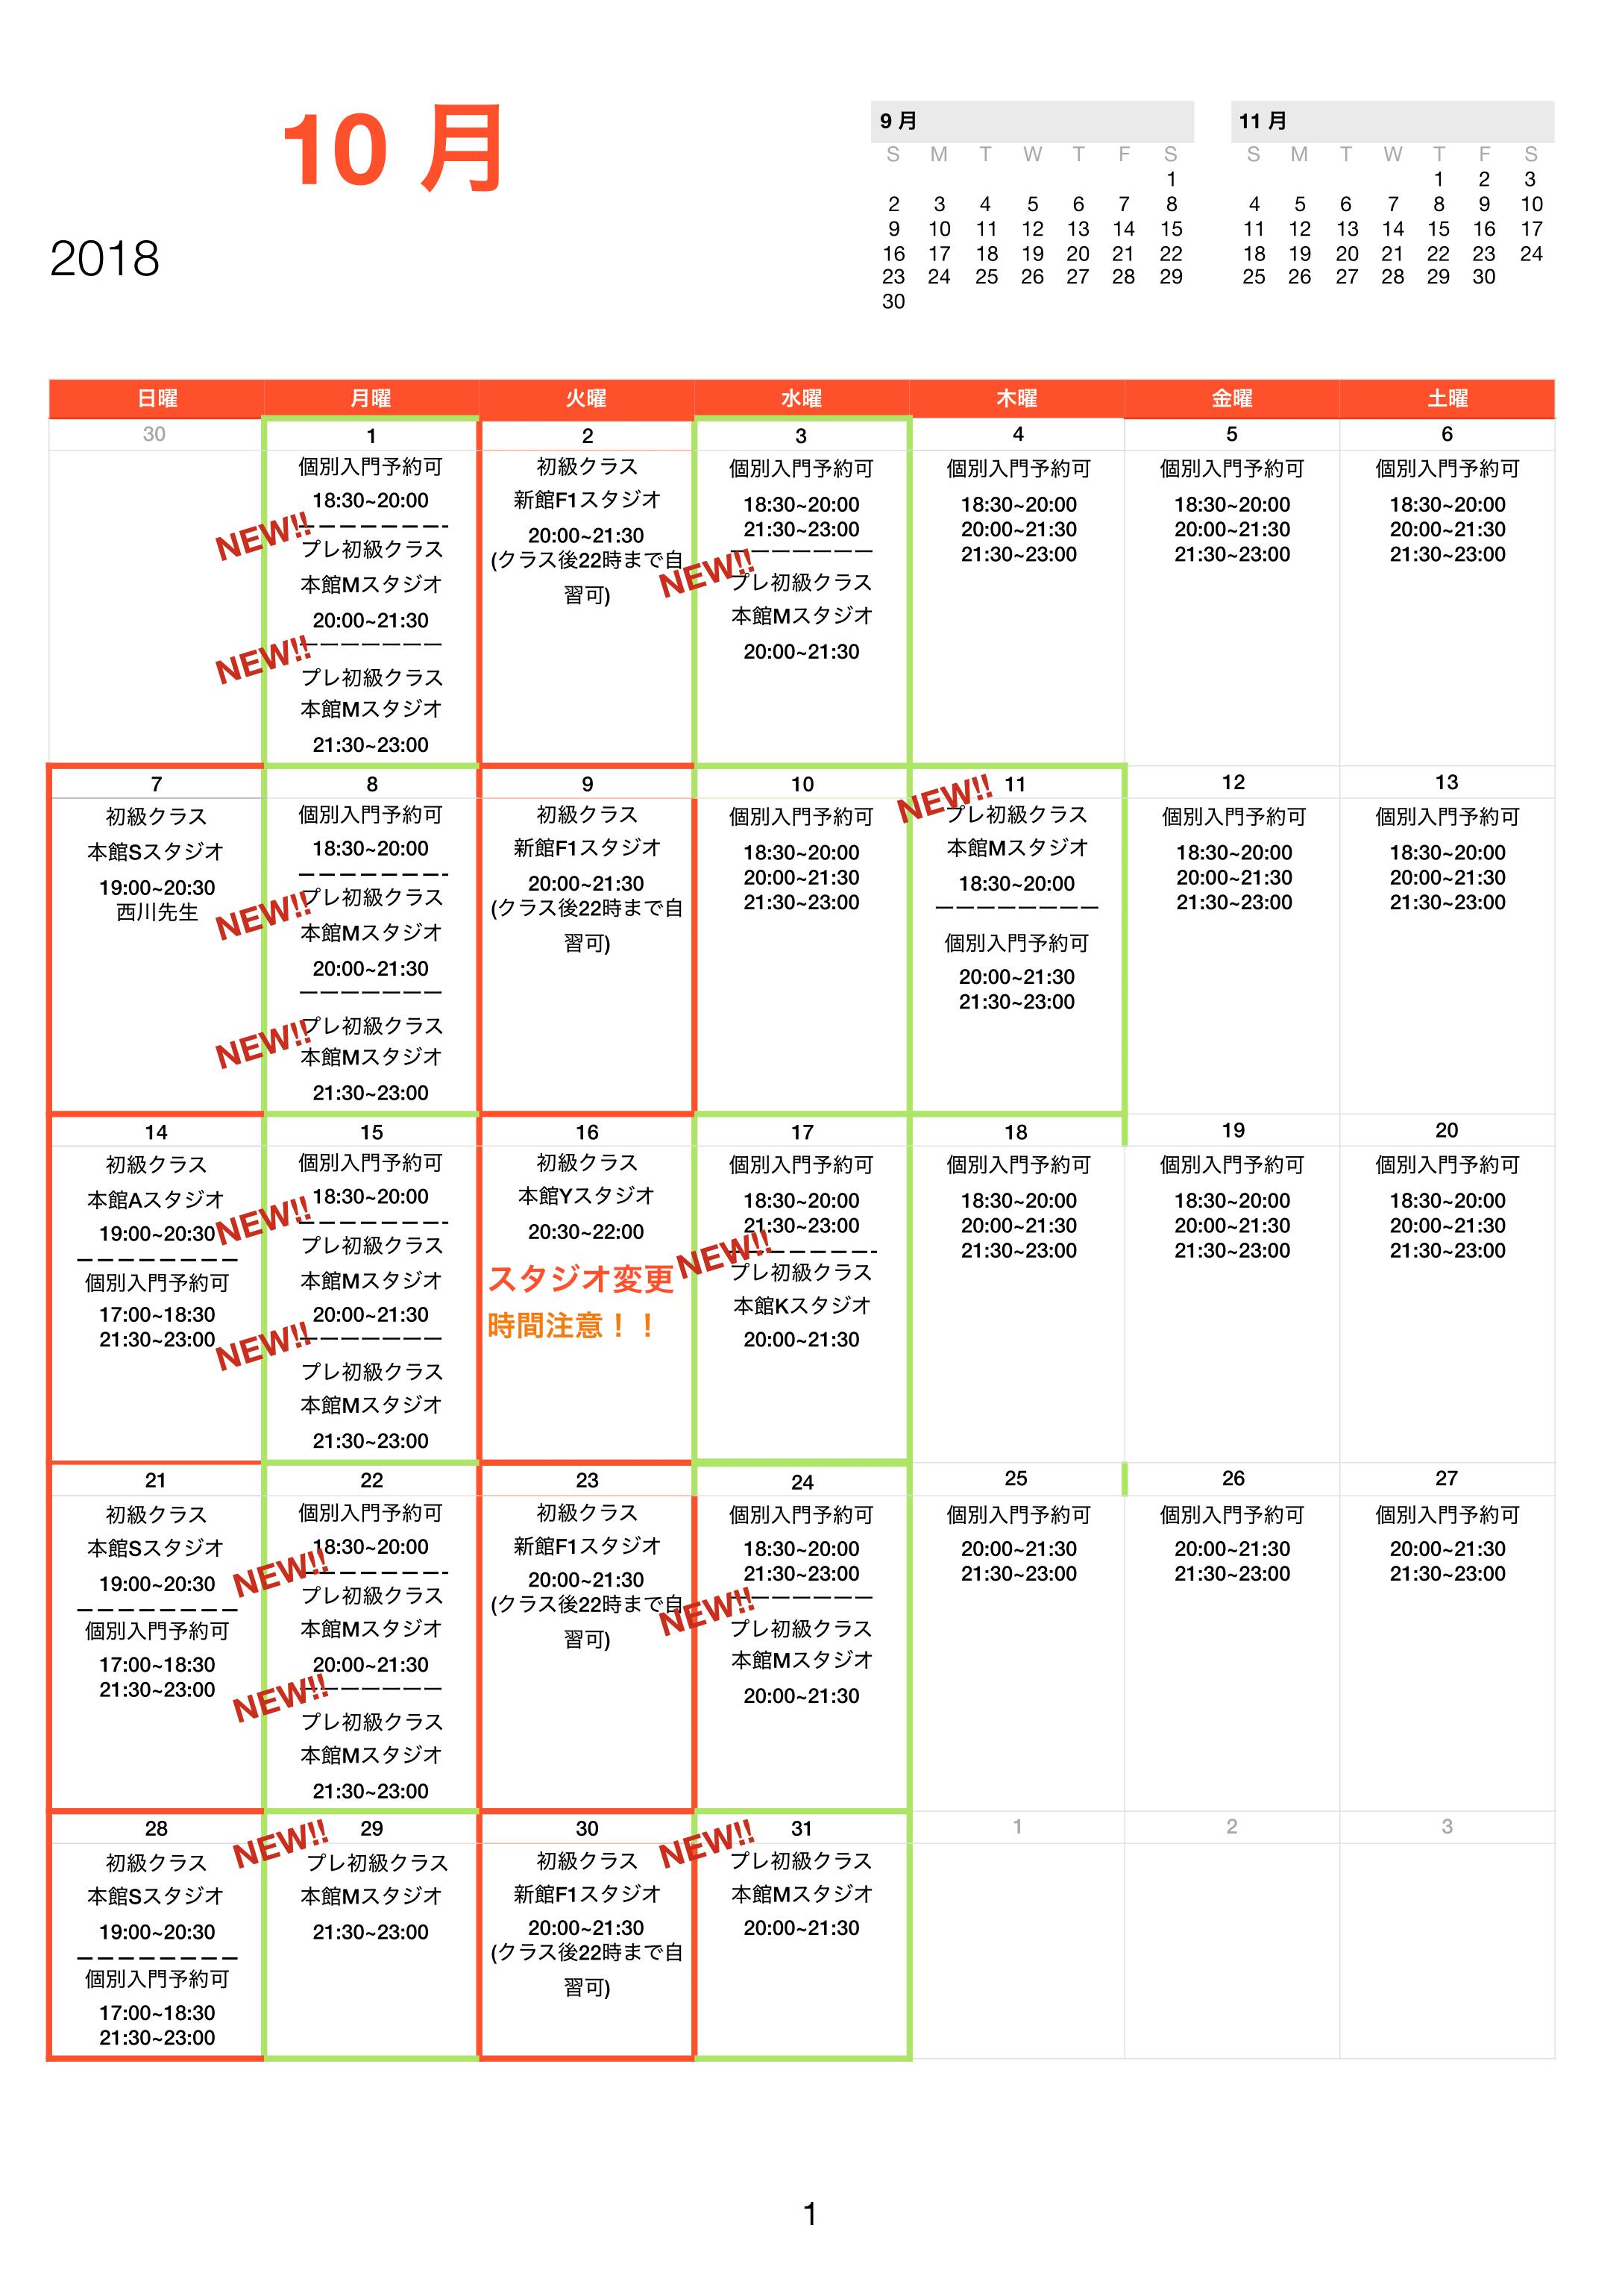 BFMsch201810vol3-1